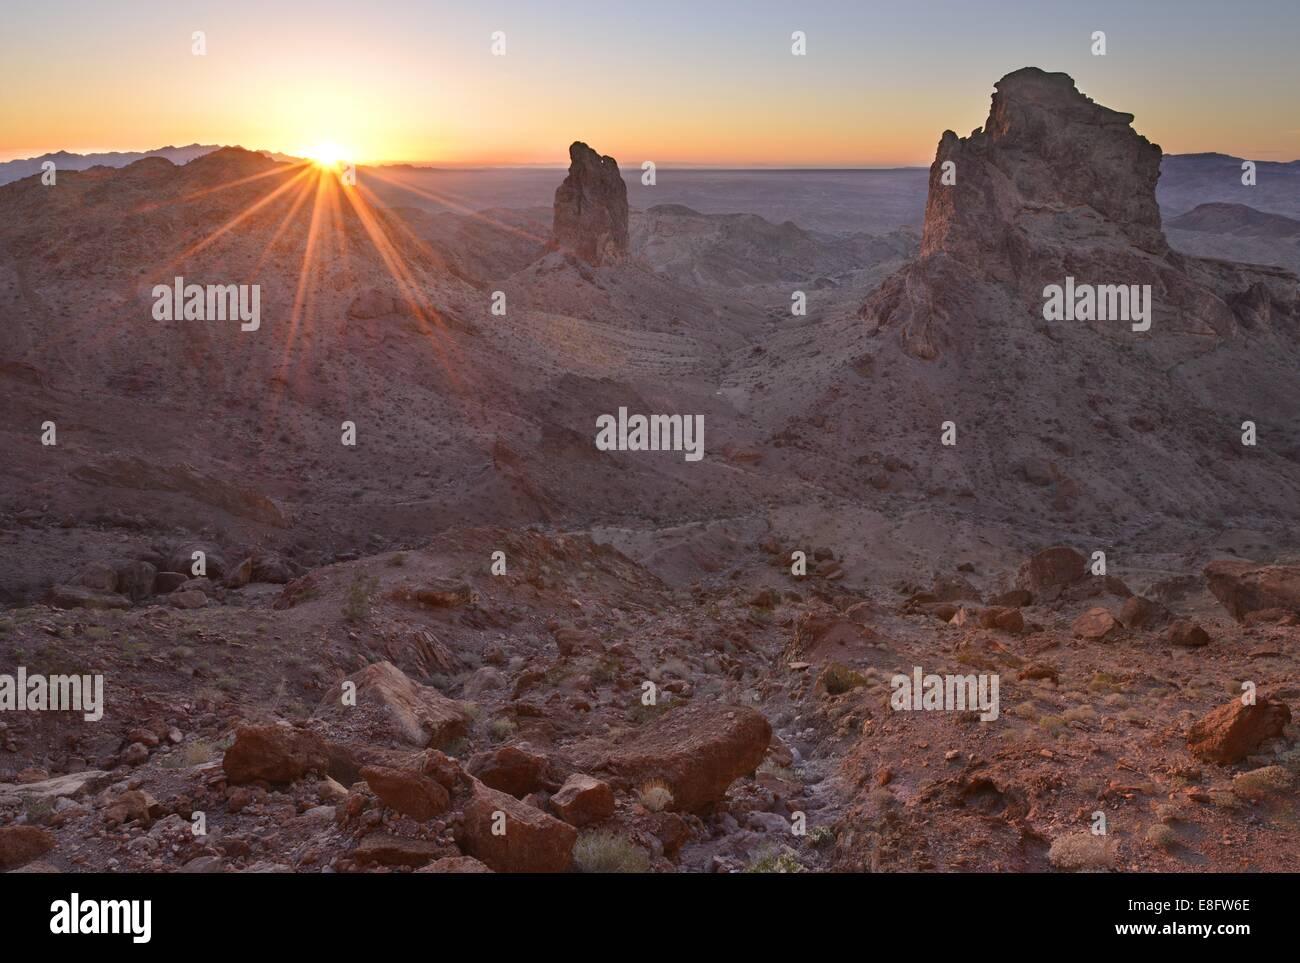 USA, California, Picacho Peak Wilderness, Sentinels of Picacho Sunset - Stock Image